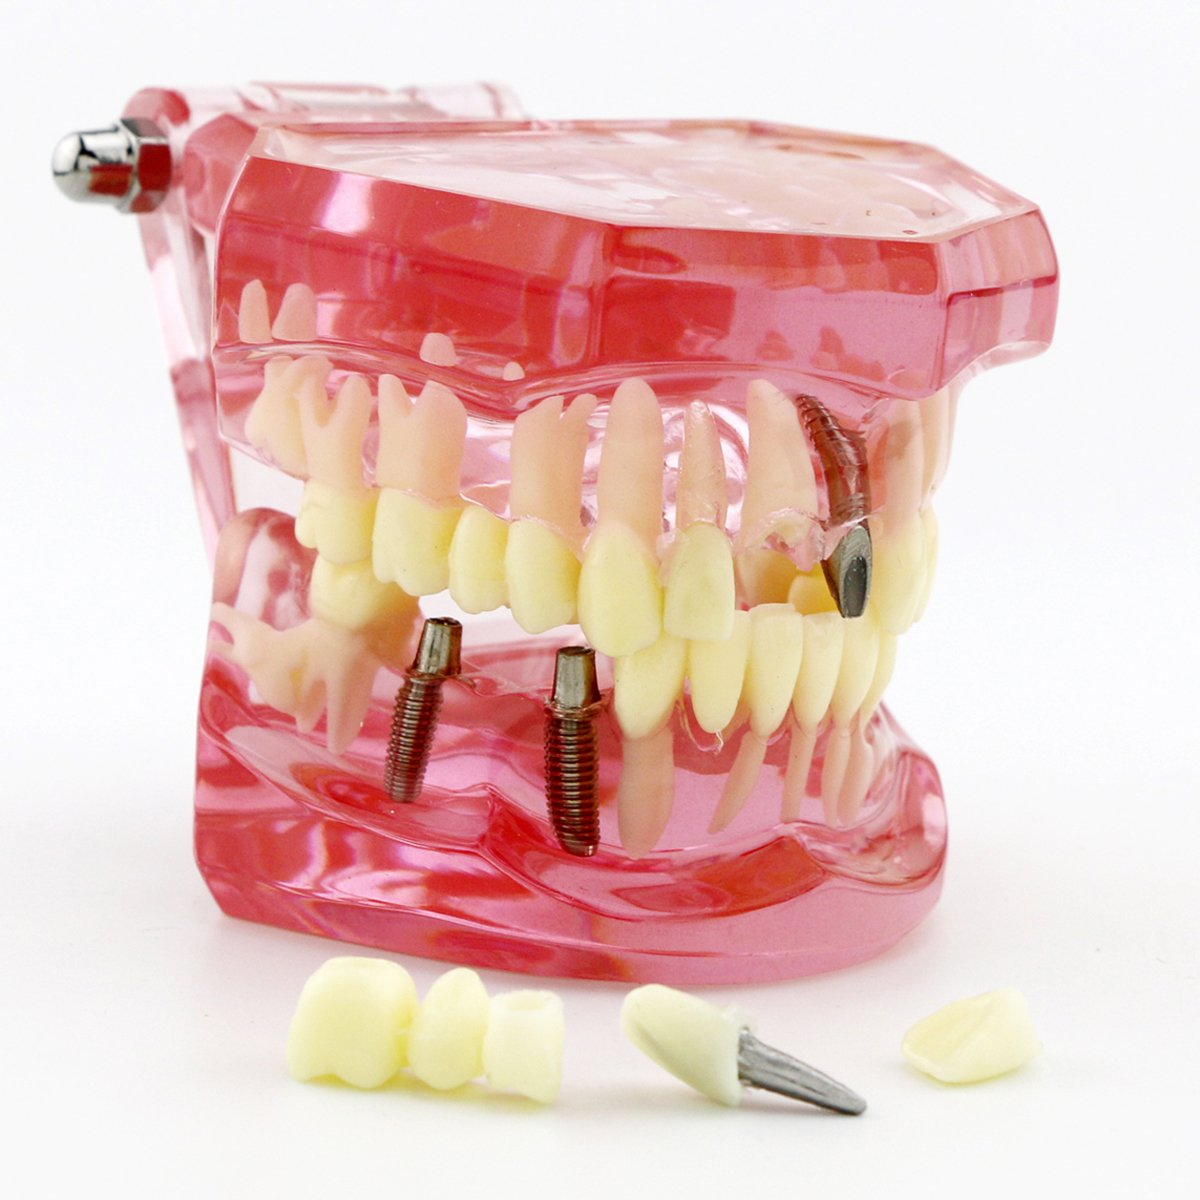 amazon com dental power 3 5x binocular loupes 420mm working